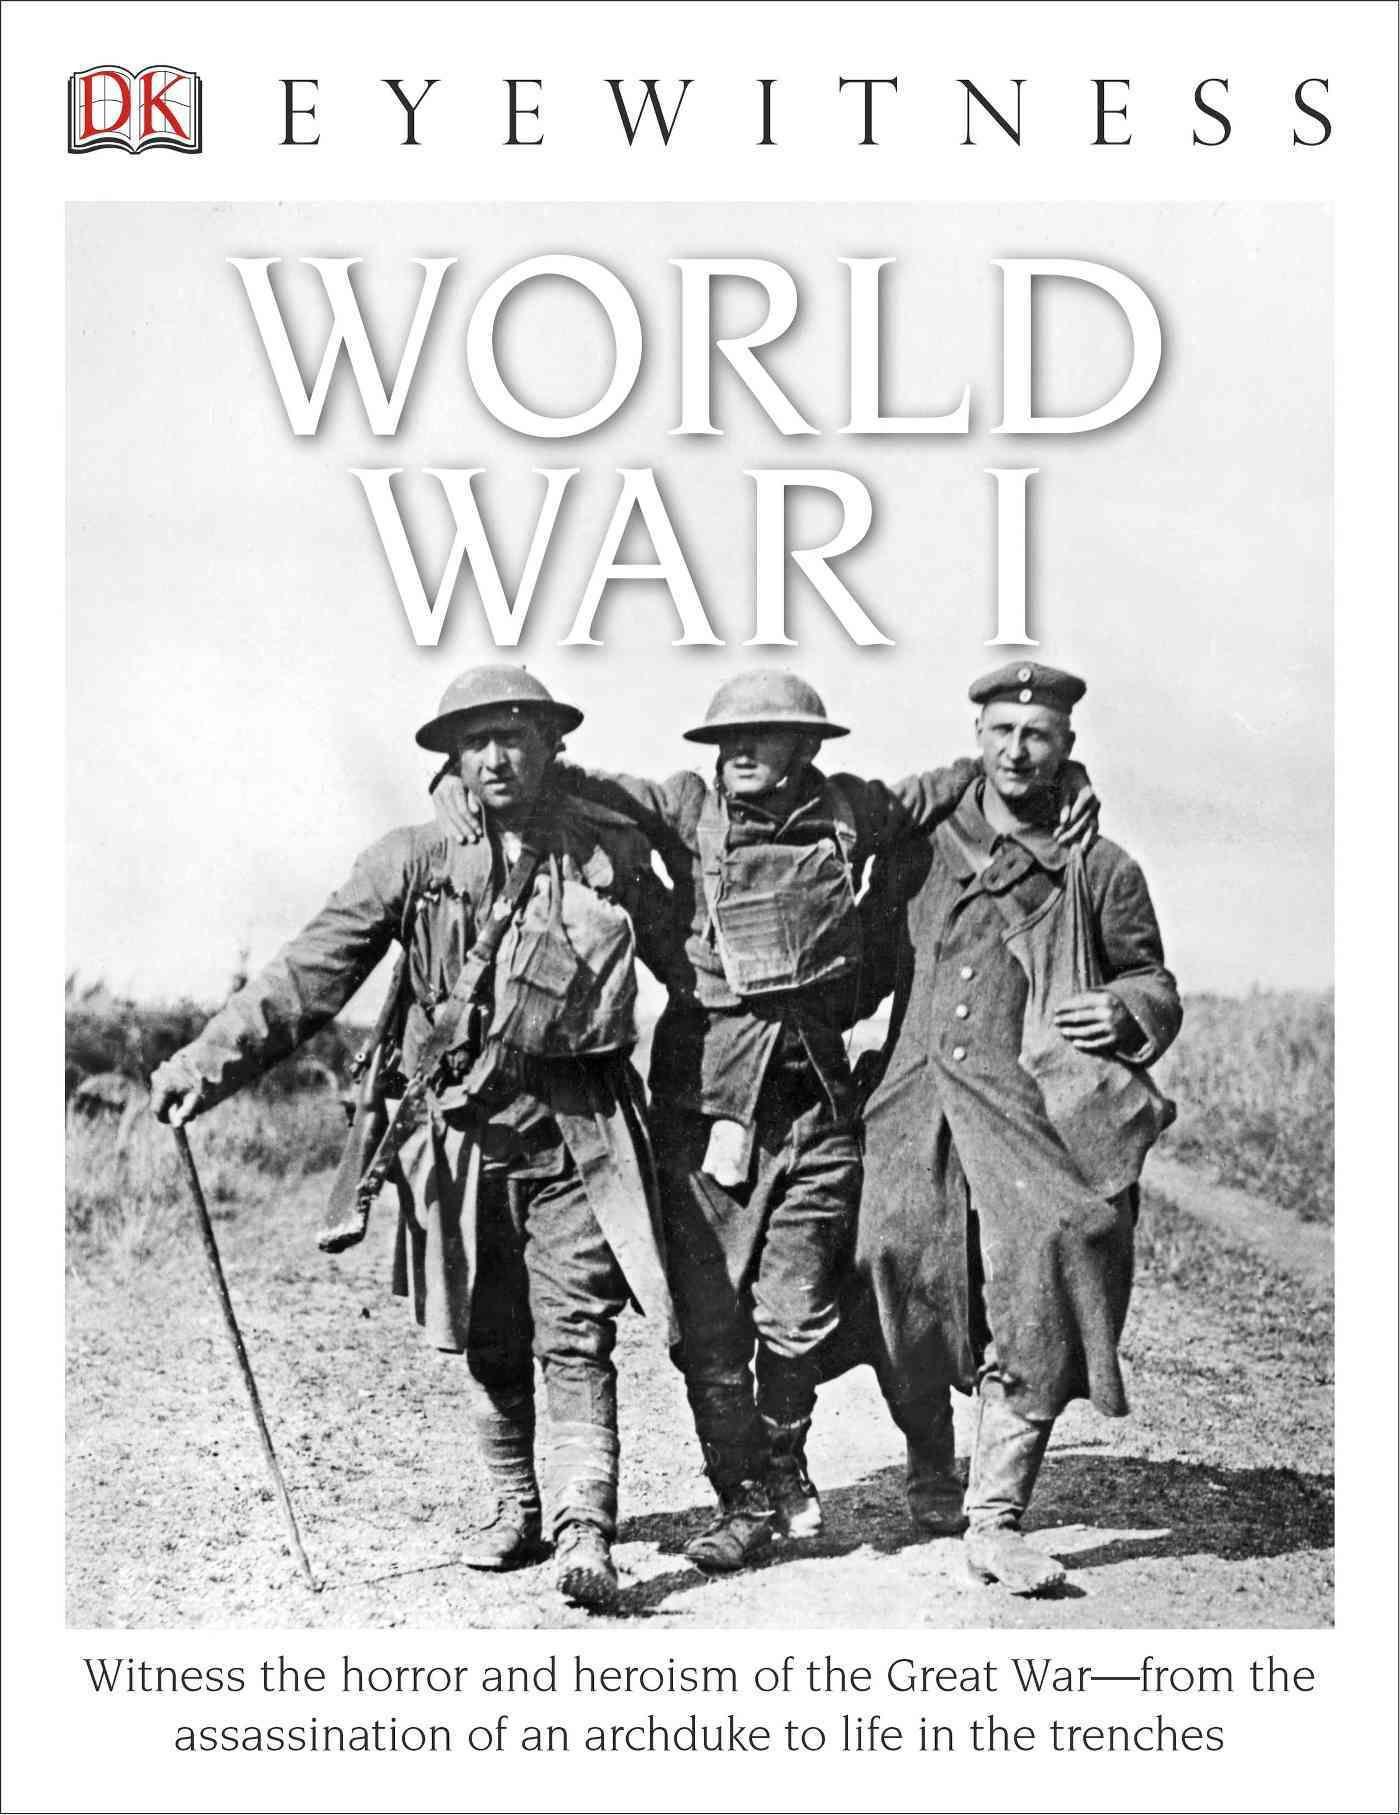 Eyewitness World War I | Products | Pinterest | Online book store ...